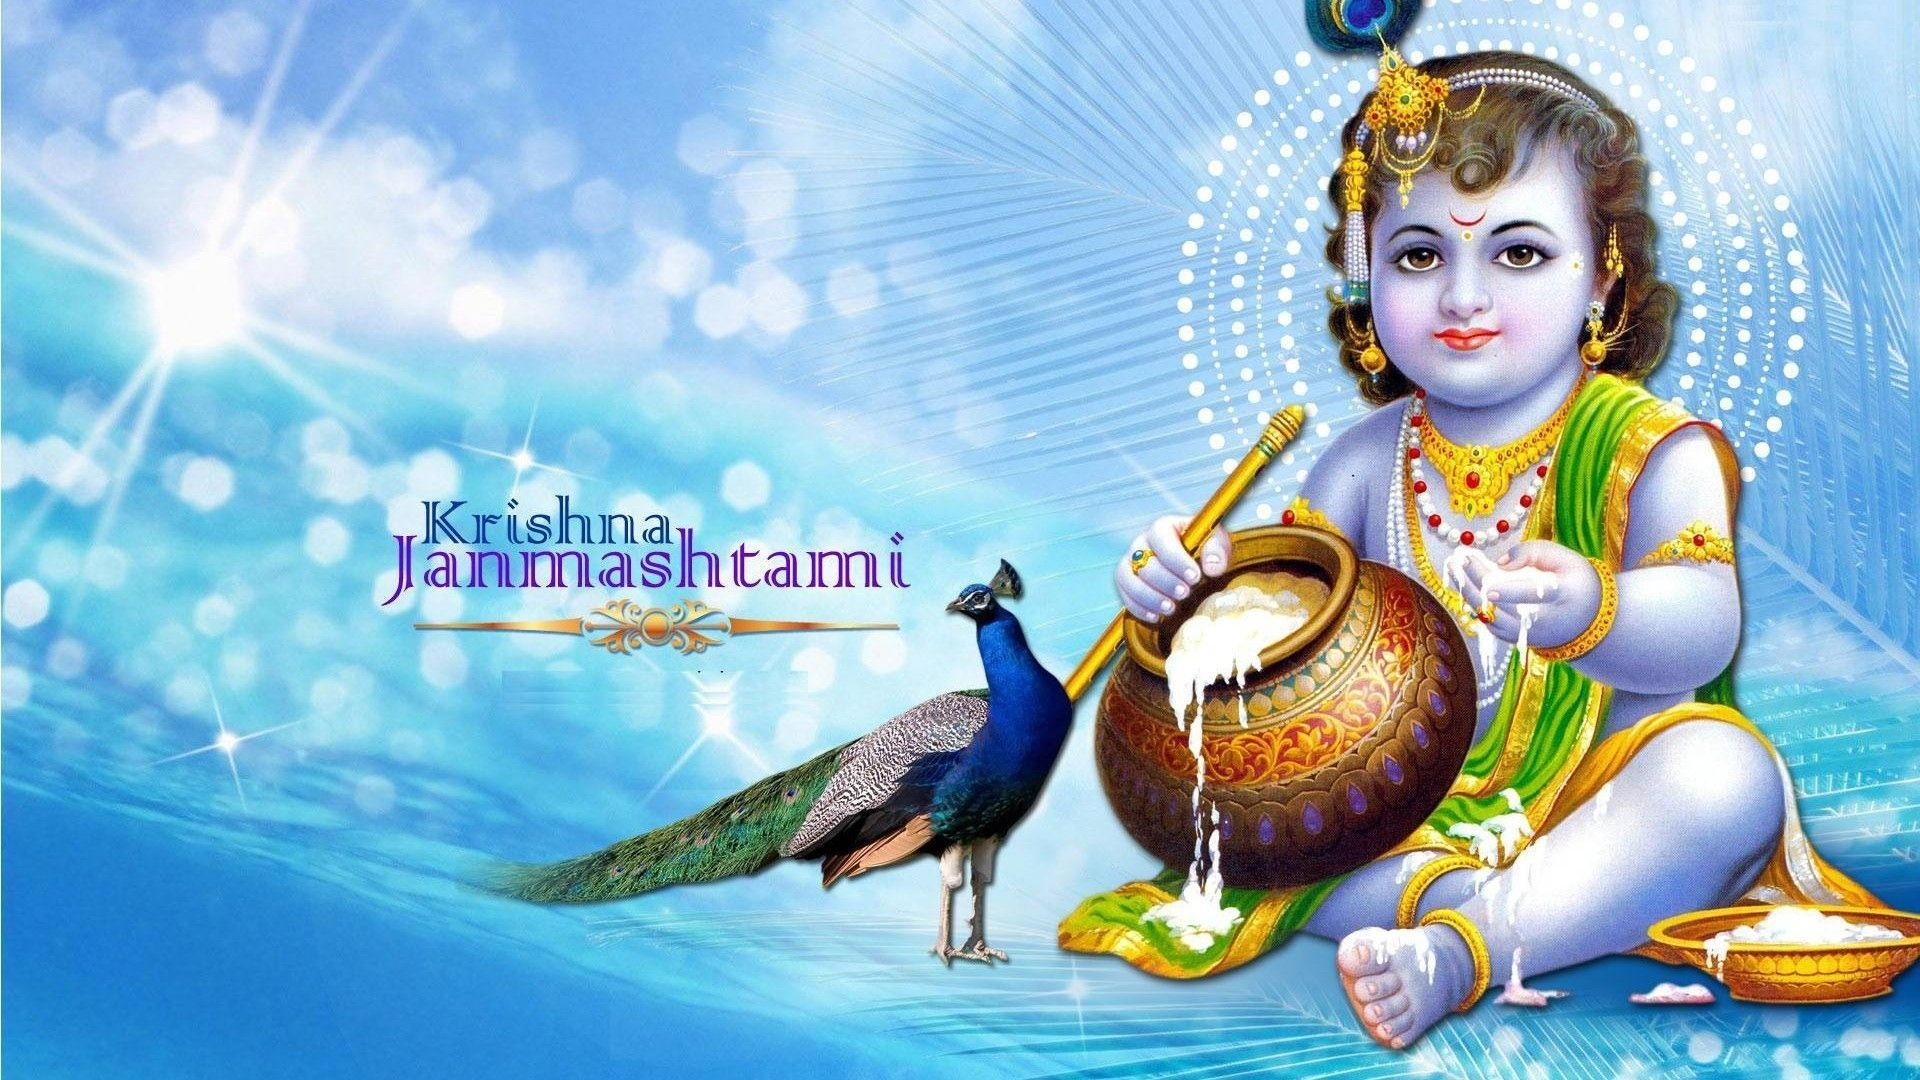 Gorgerous Lord Krishna Wallpaper 2018 Ios   Data-src - Sri Krishna Janmashtami 2018 - HD Wallpaper